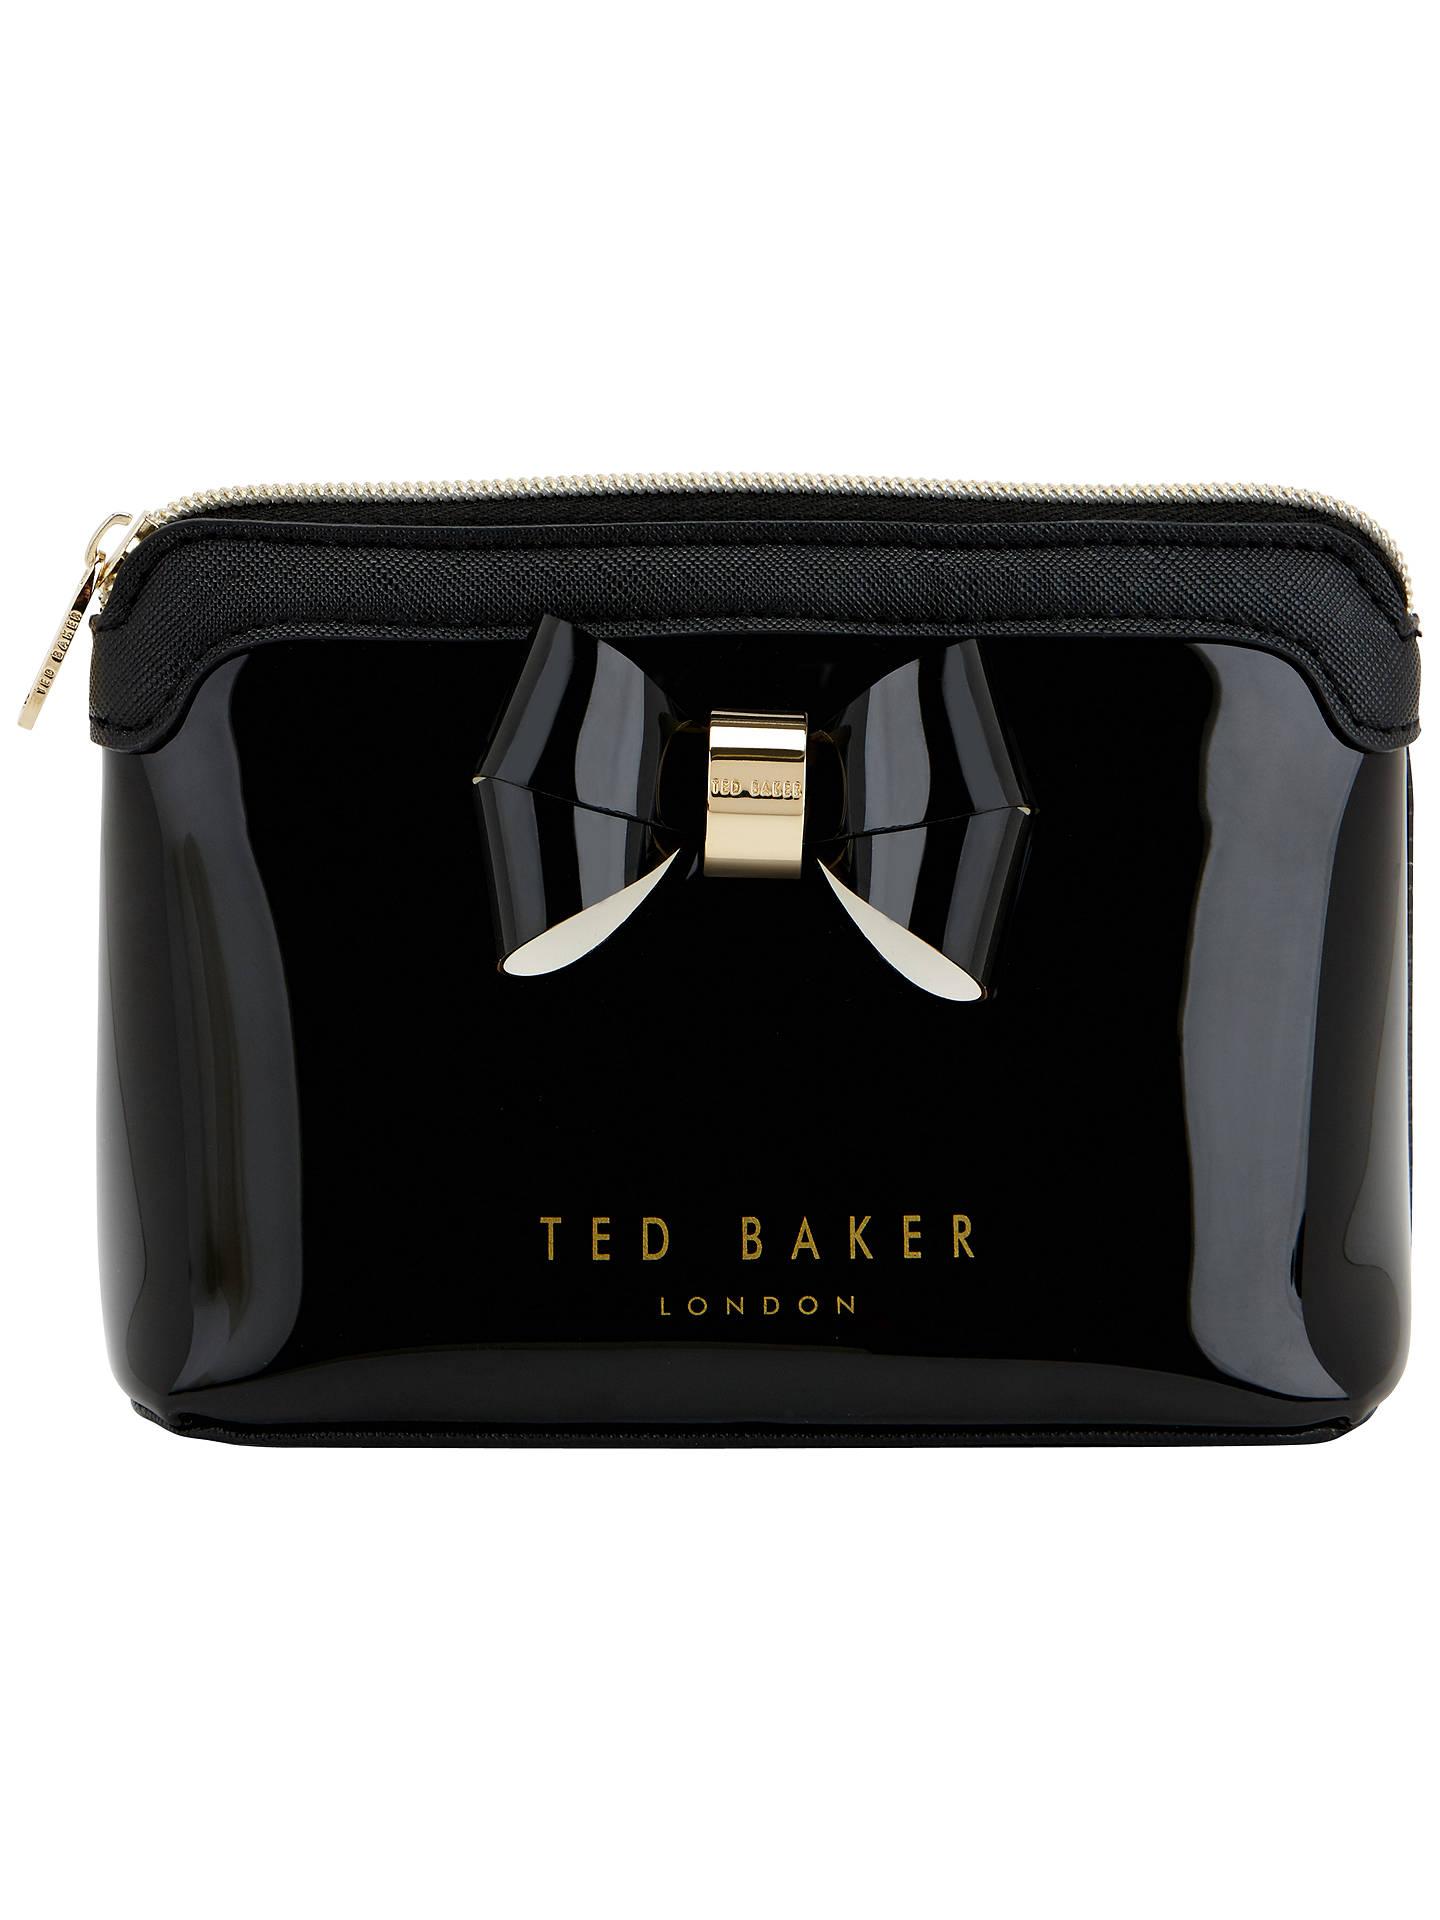 Ted Baker Harloe Bow Makeup Bag at John Lewis & Partners